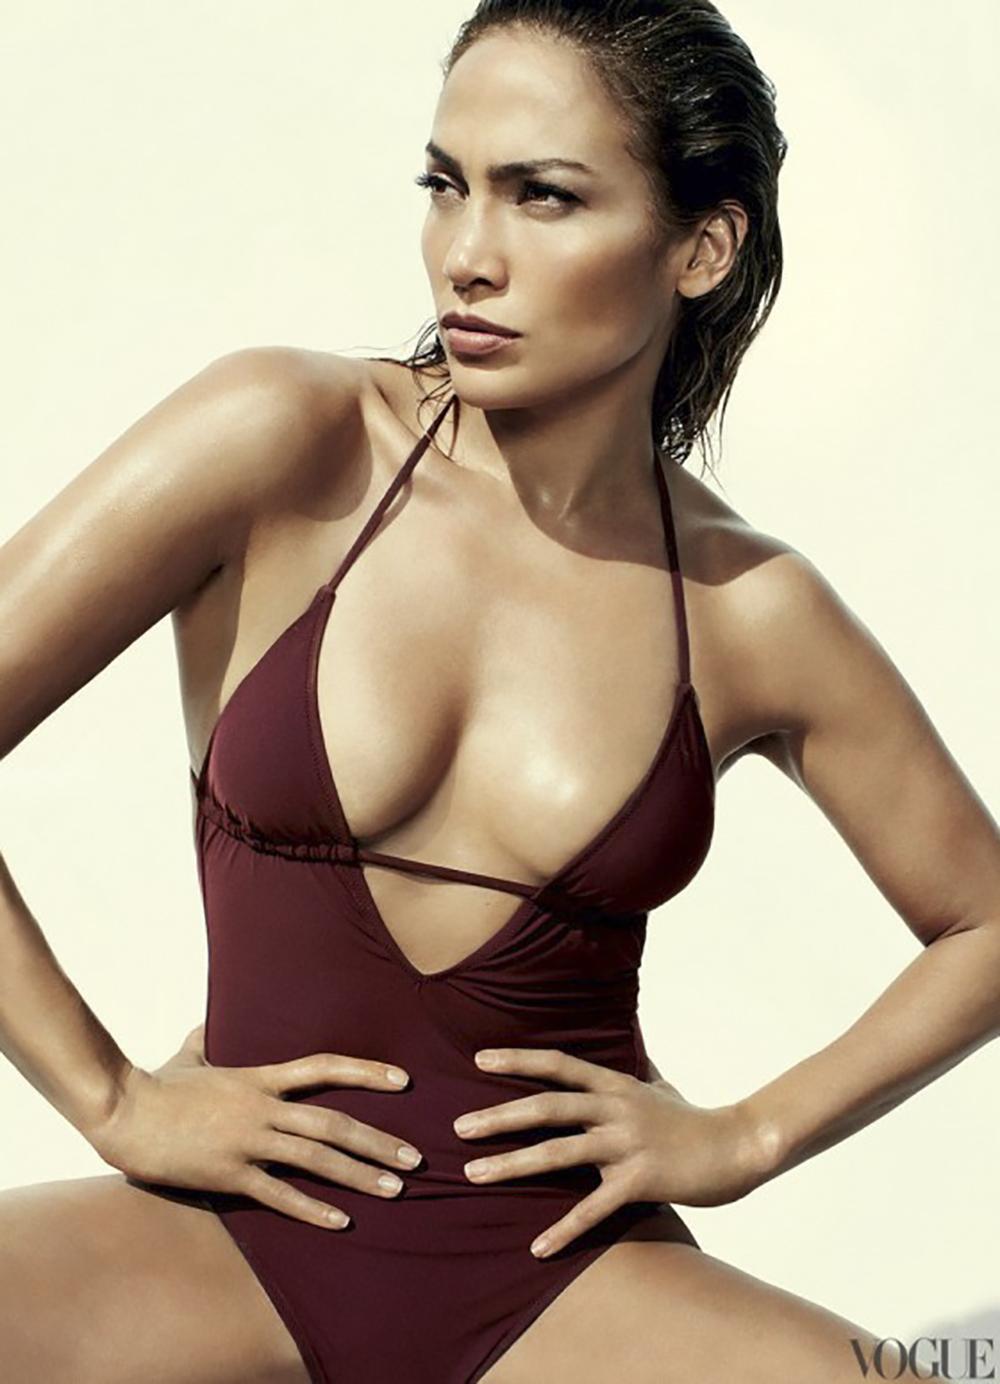 Jennifer Lopez - Bikini - Vogue-01-560x775